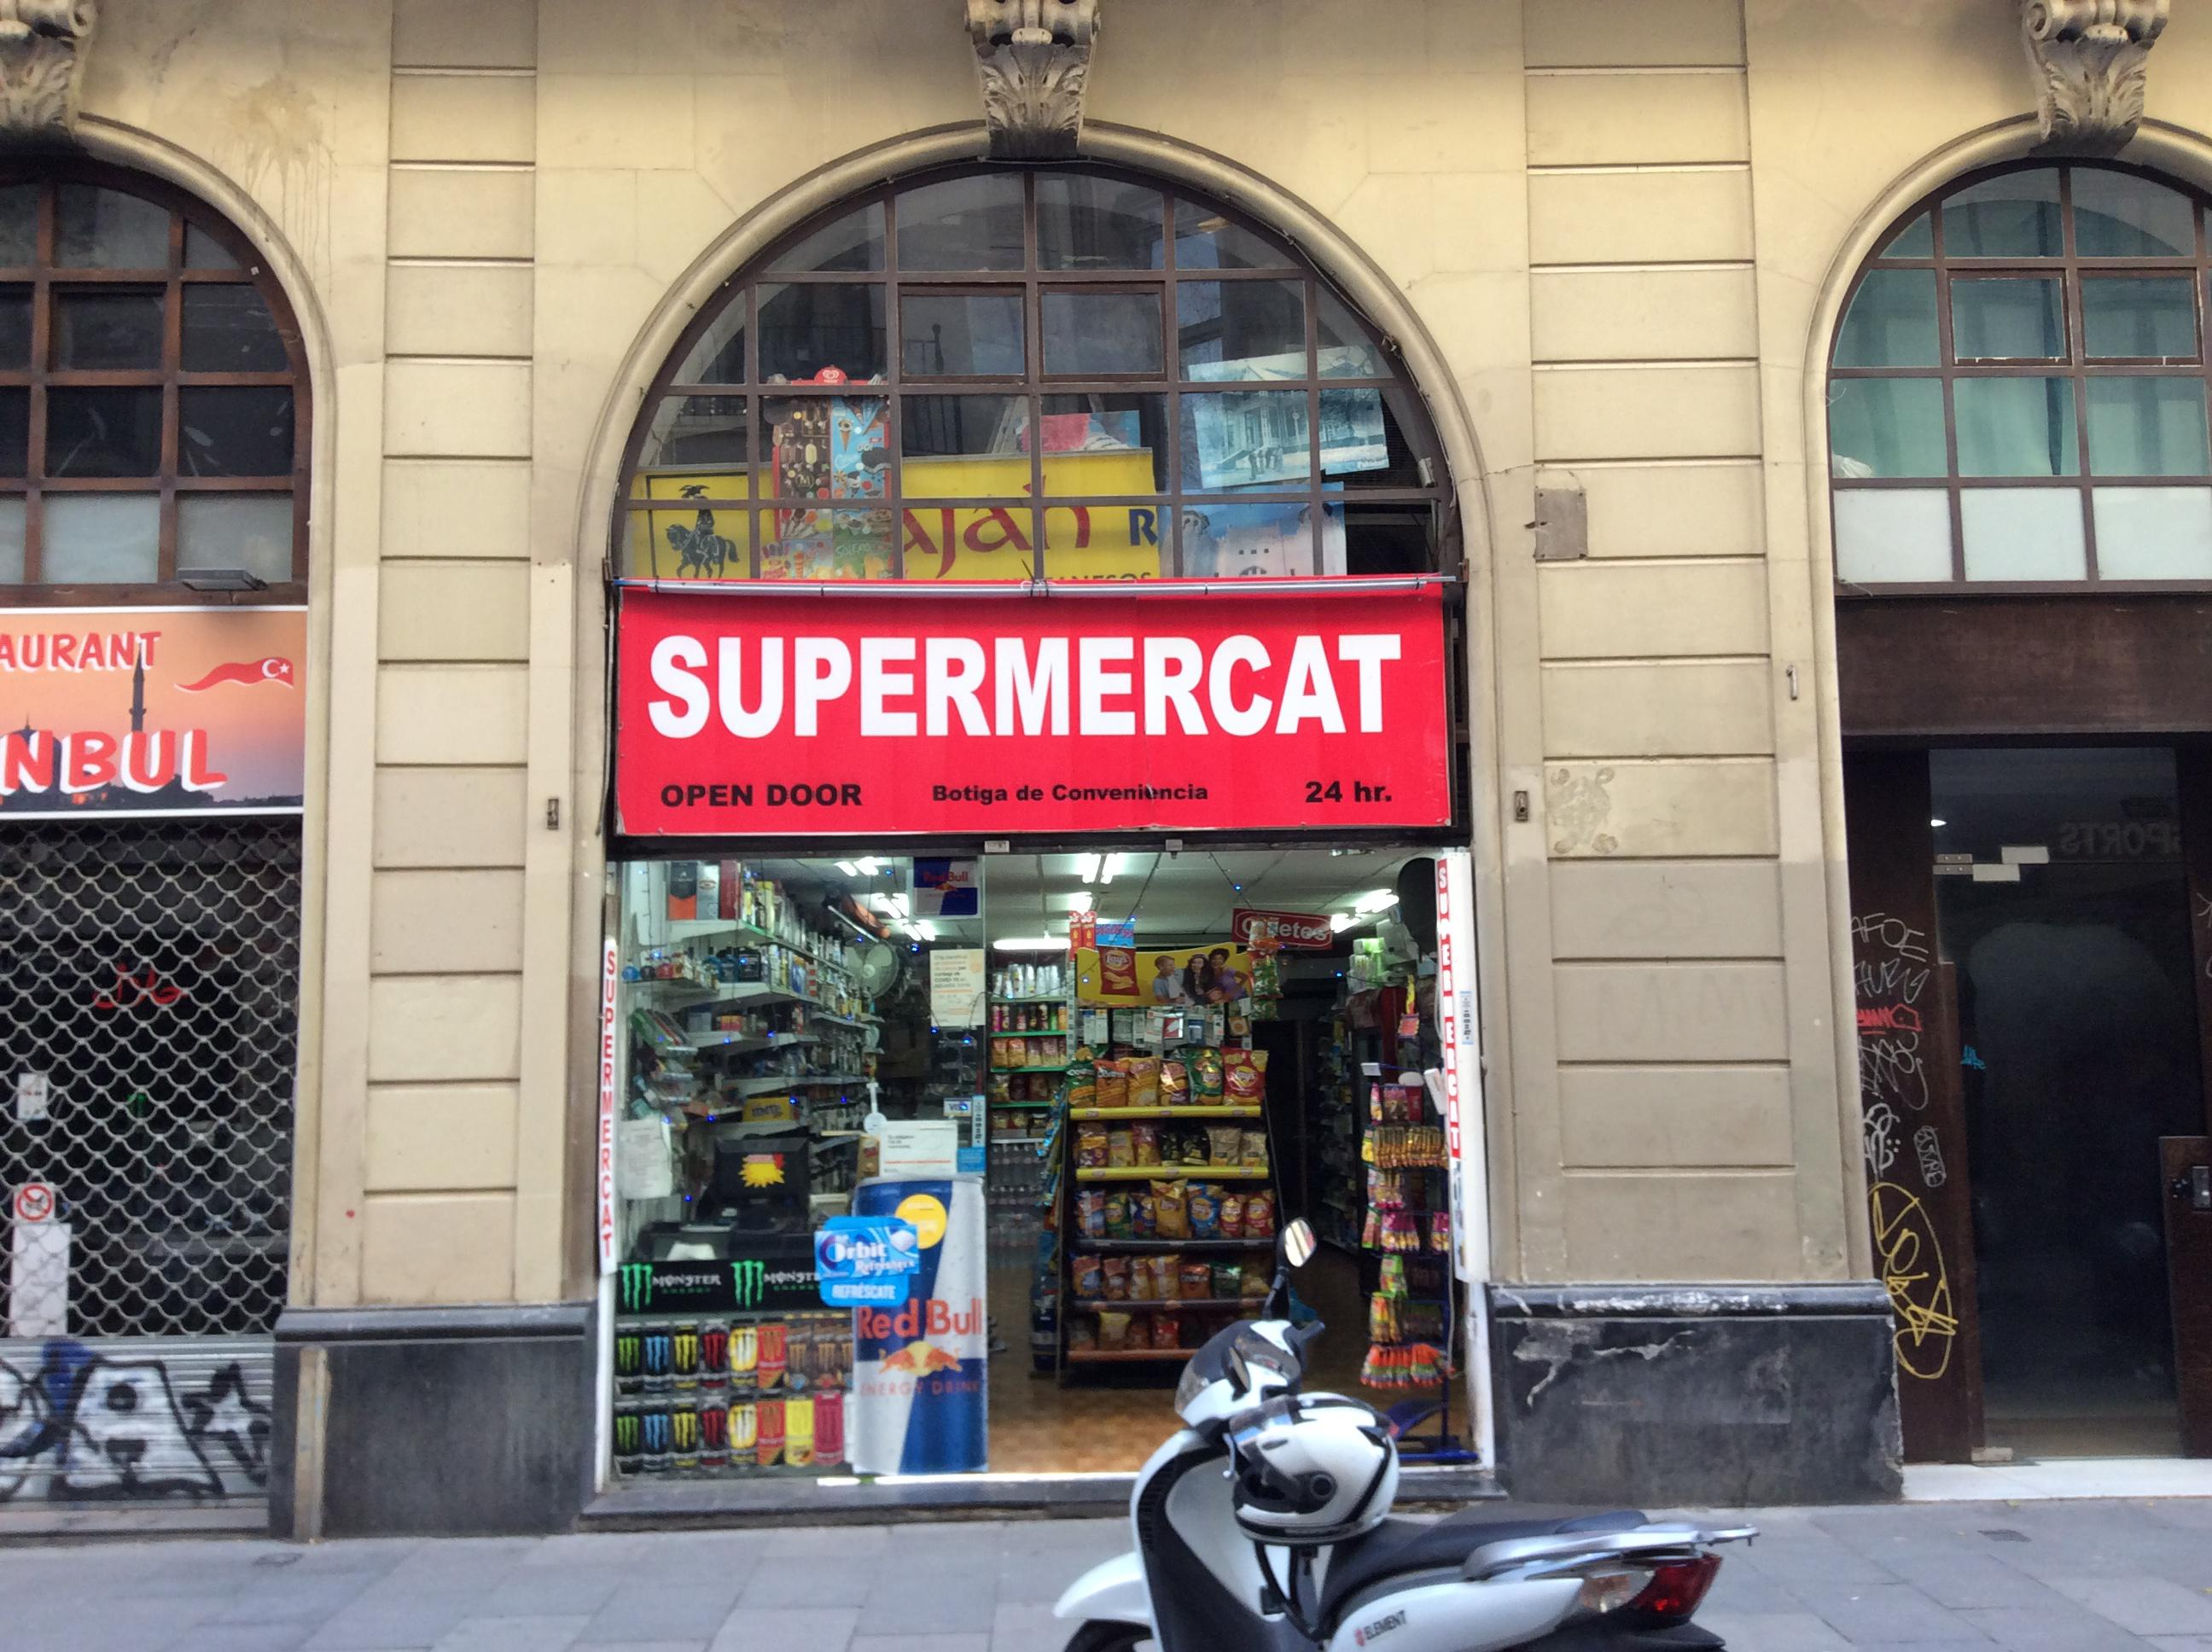 246131 Local Comercial en venda en Ciutat Vella, El Raval 6